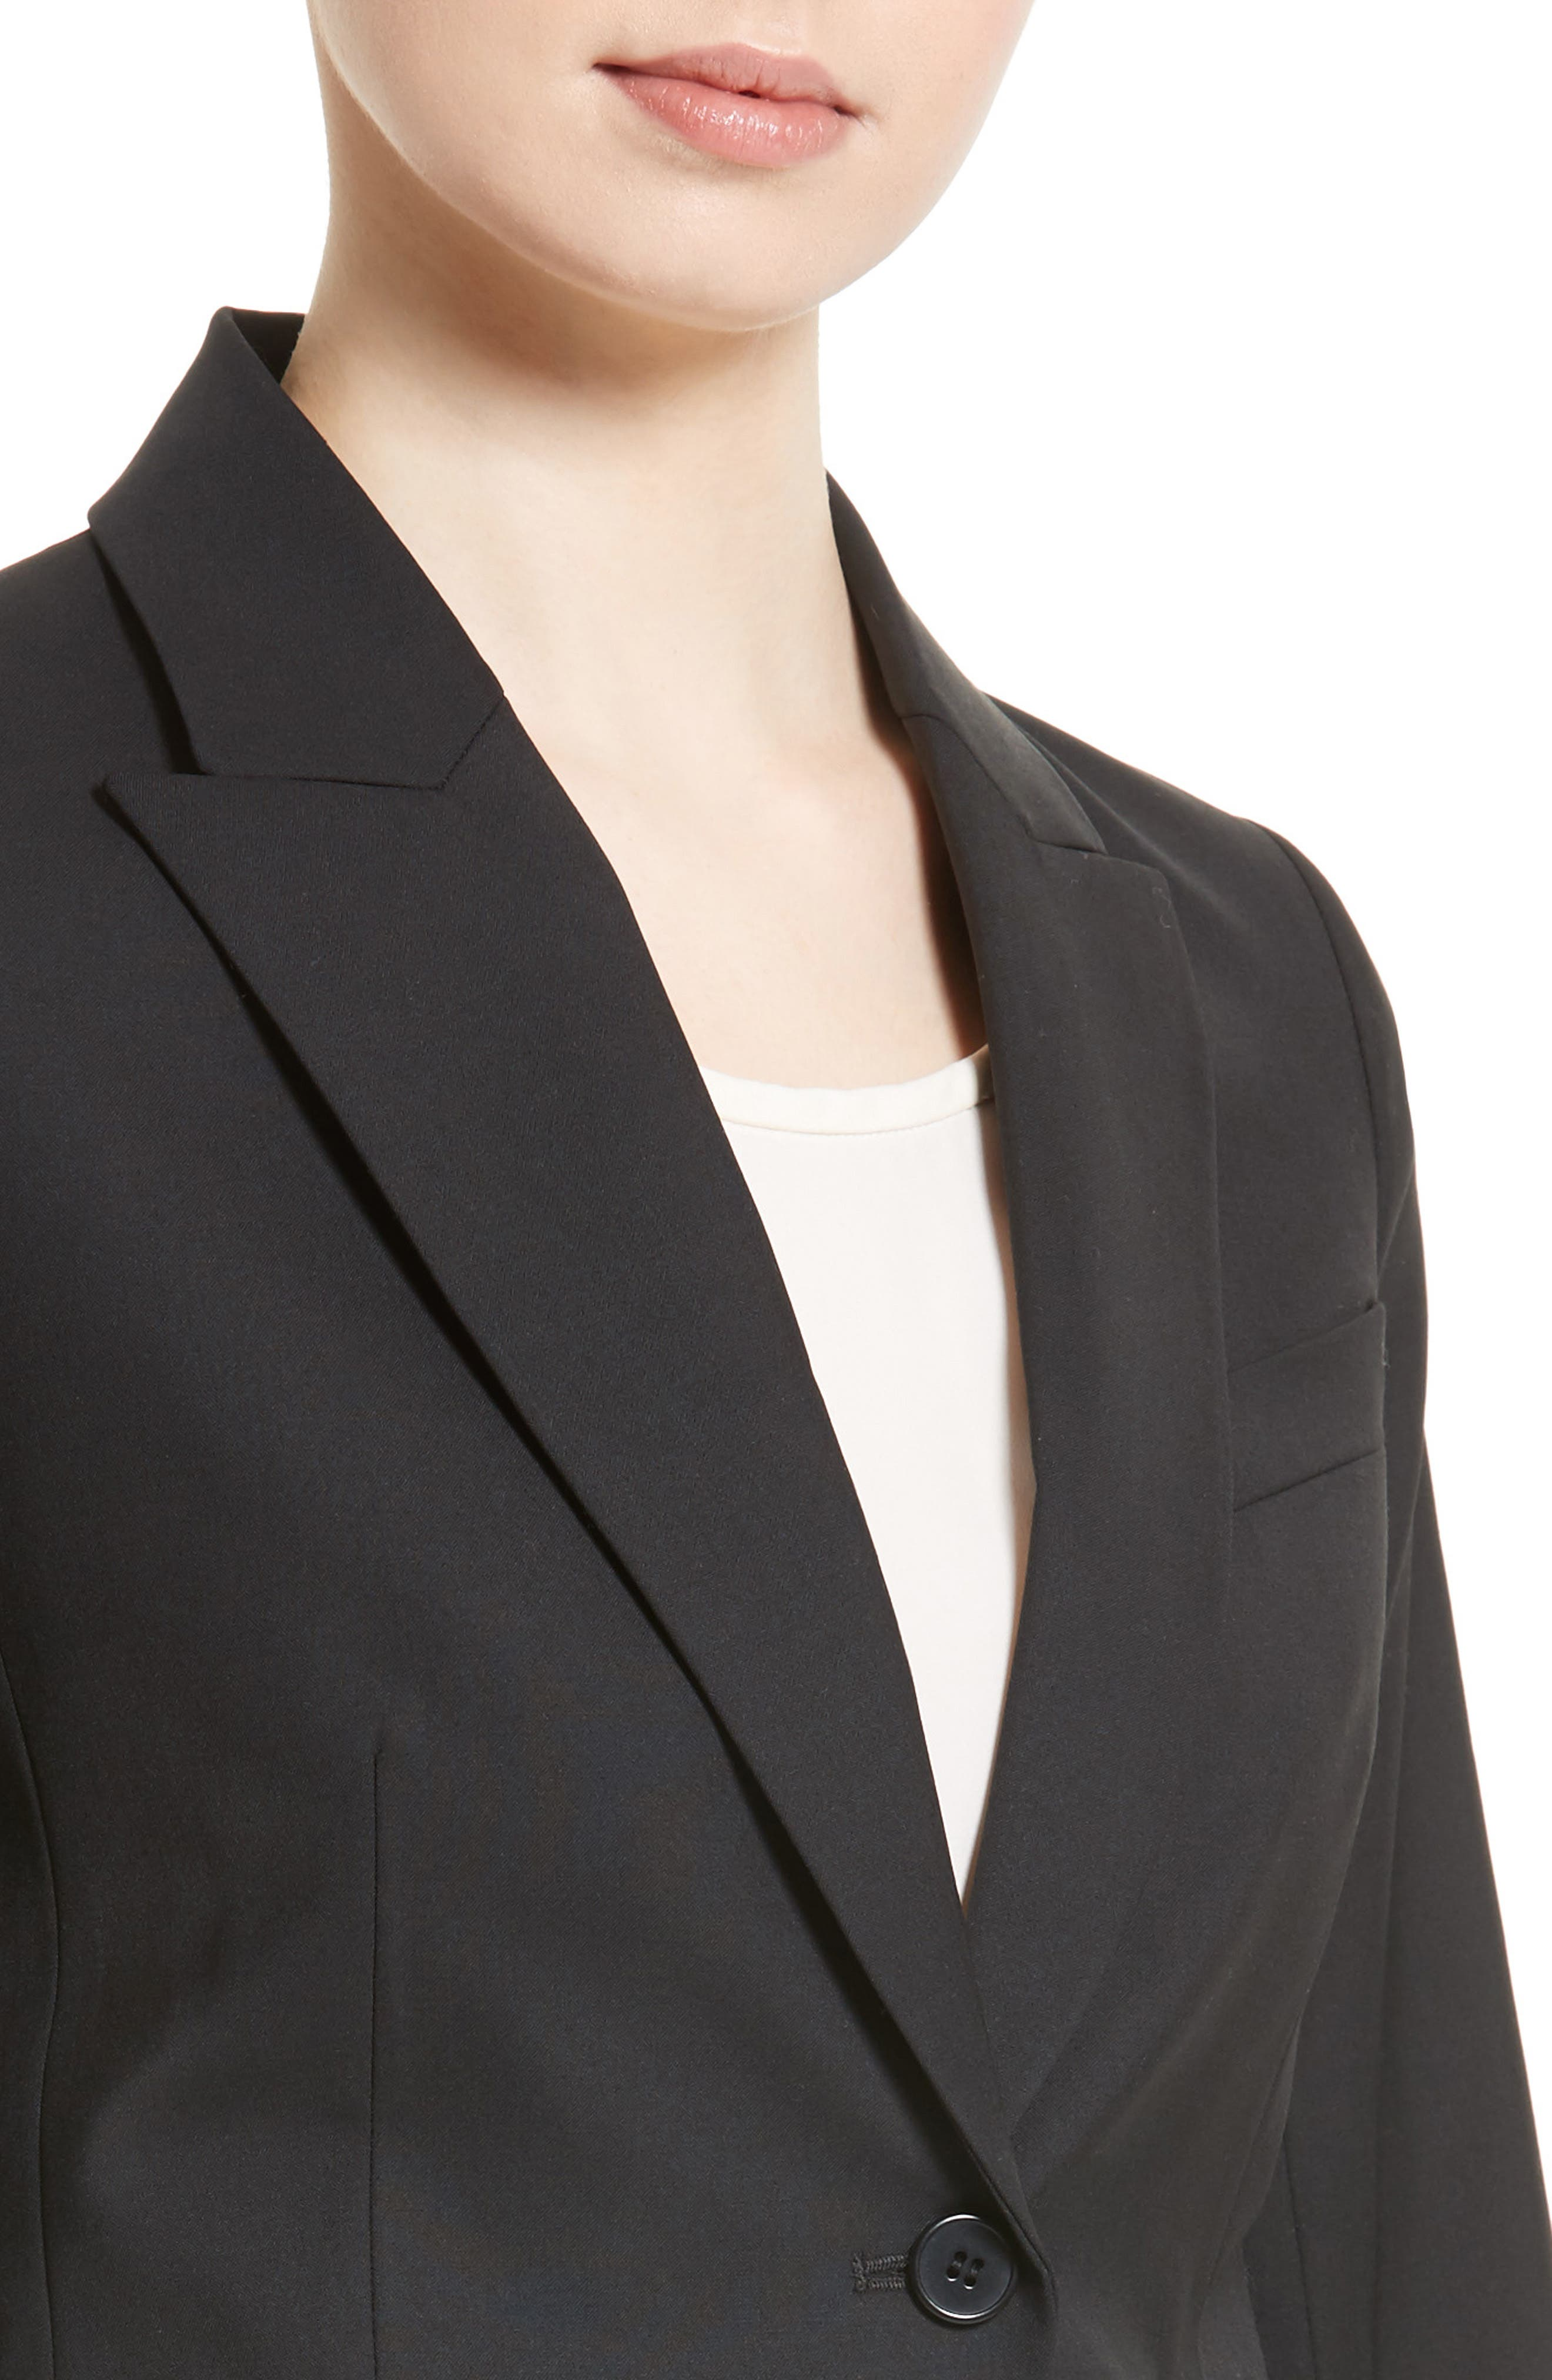 Brince B Good Wool Suit Jacket,                             Alternate thumbnail 4, color,                             BLACK